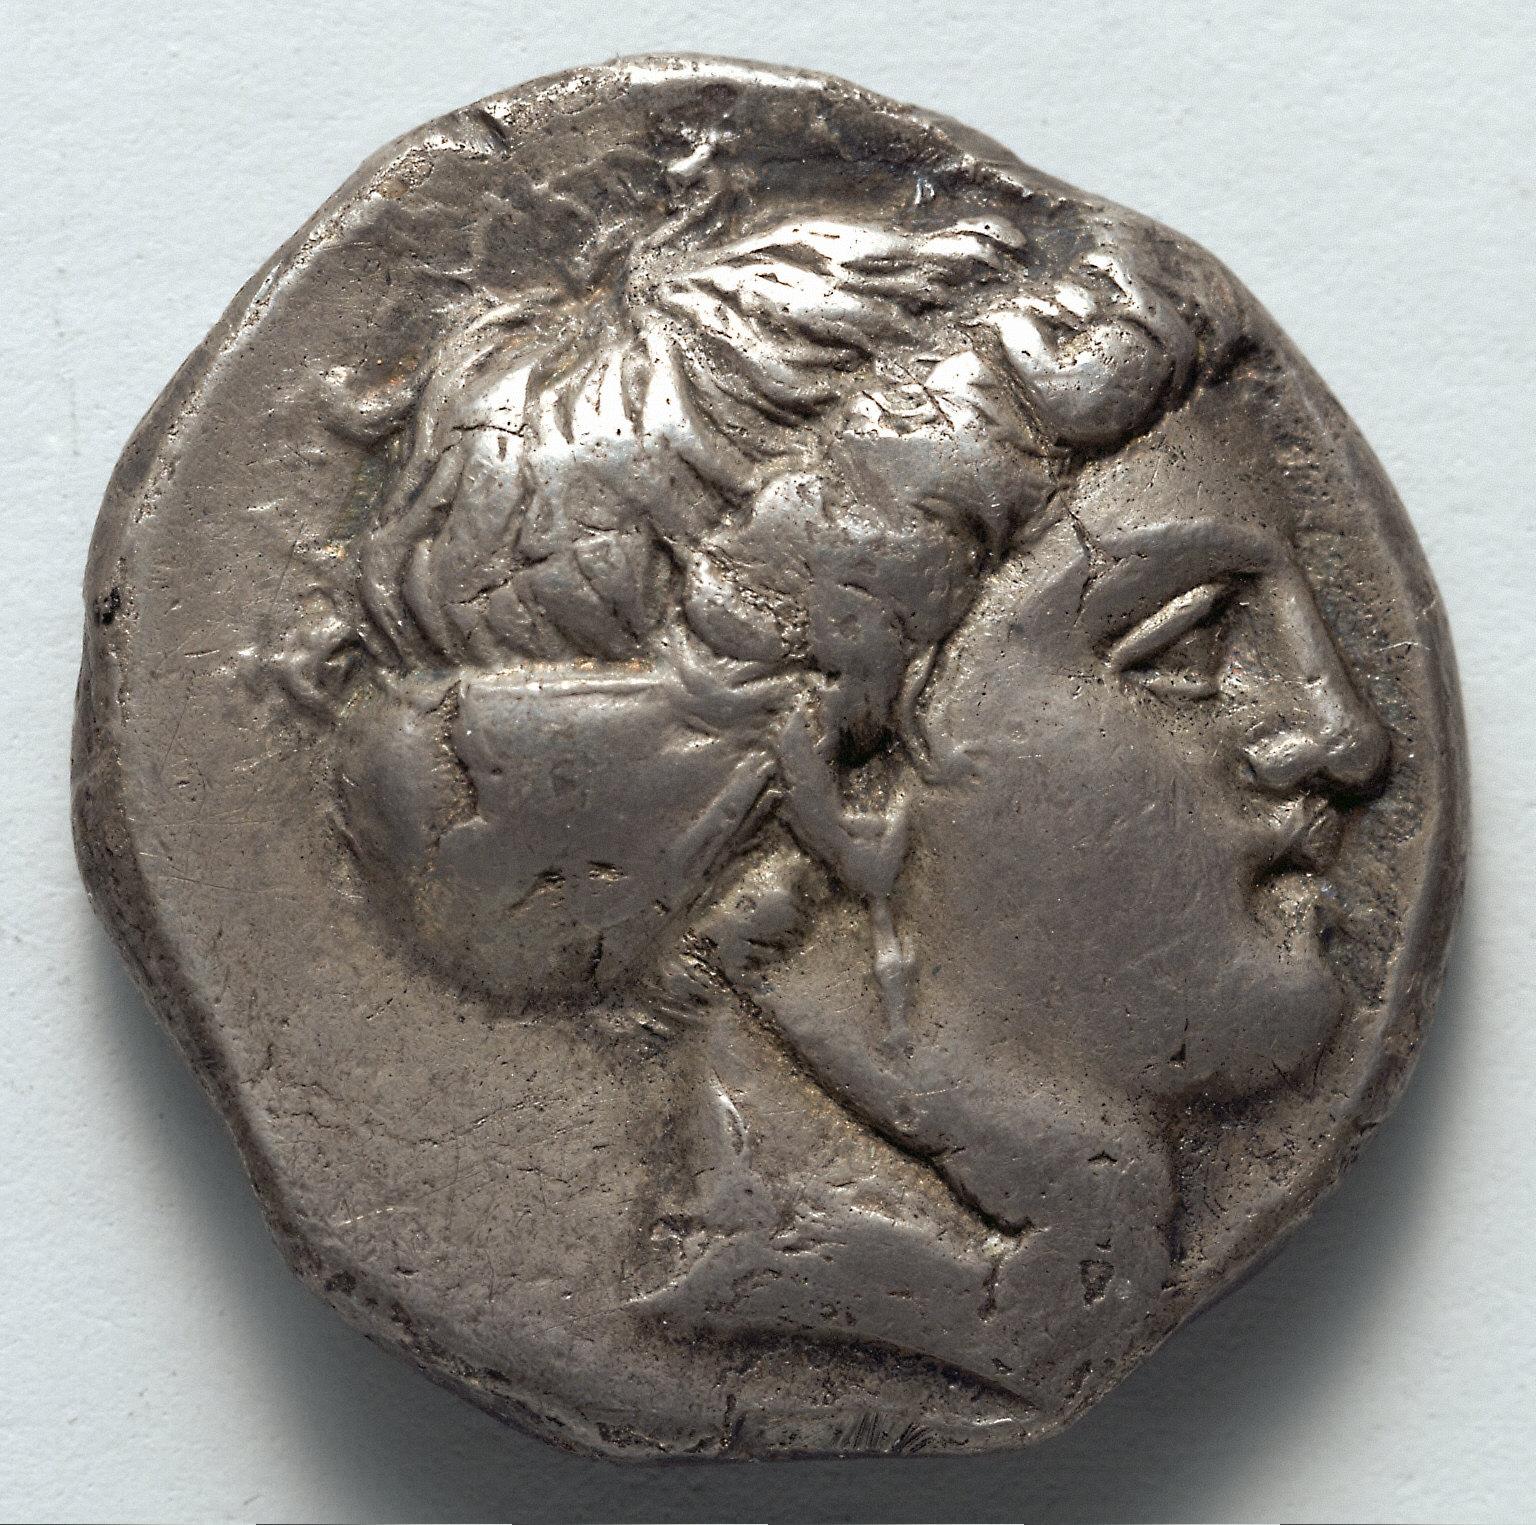 Stater: Head of Koré (obverse)